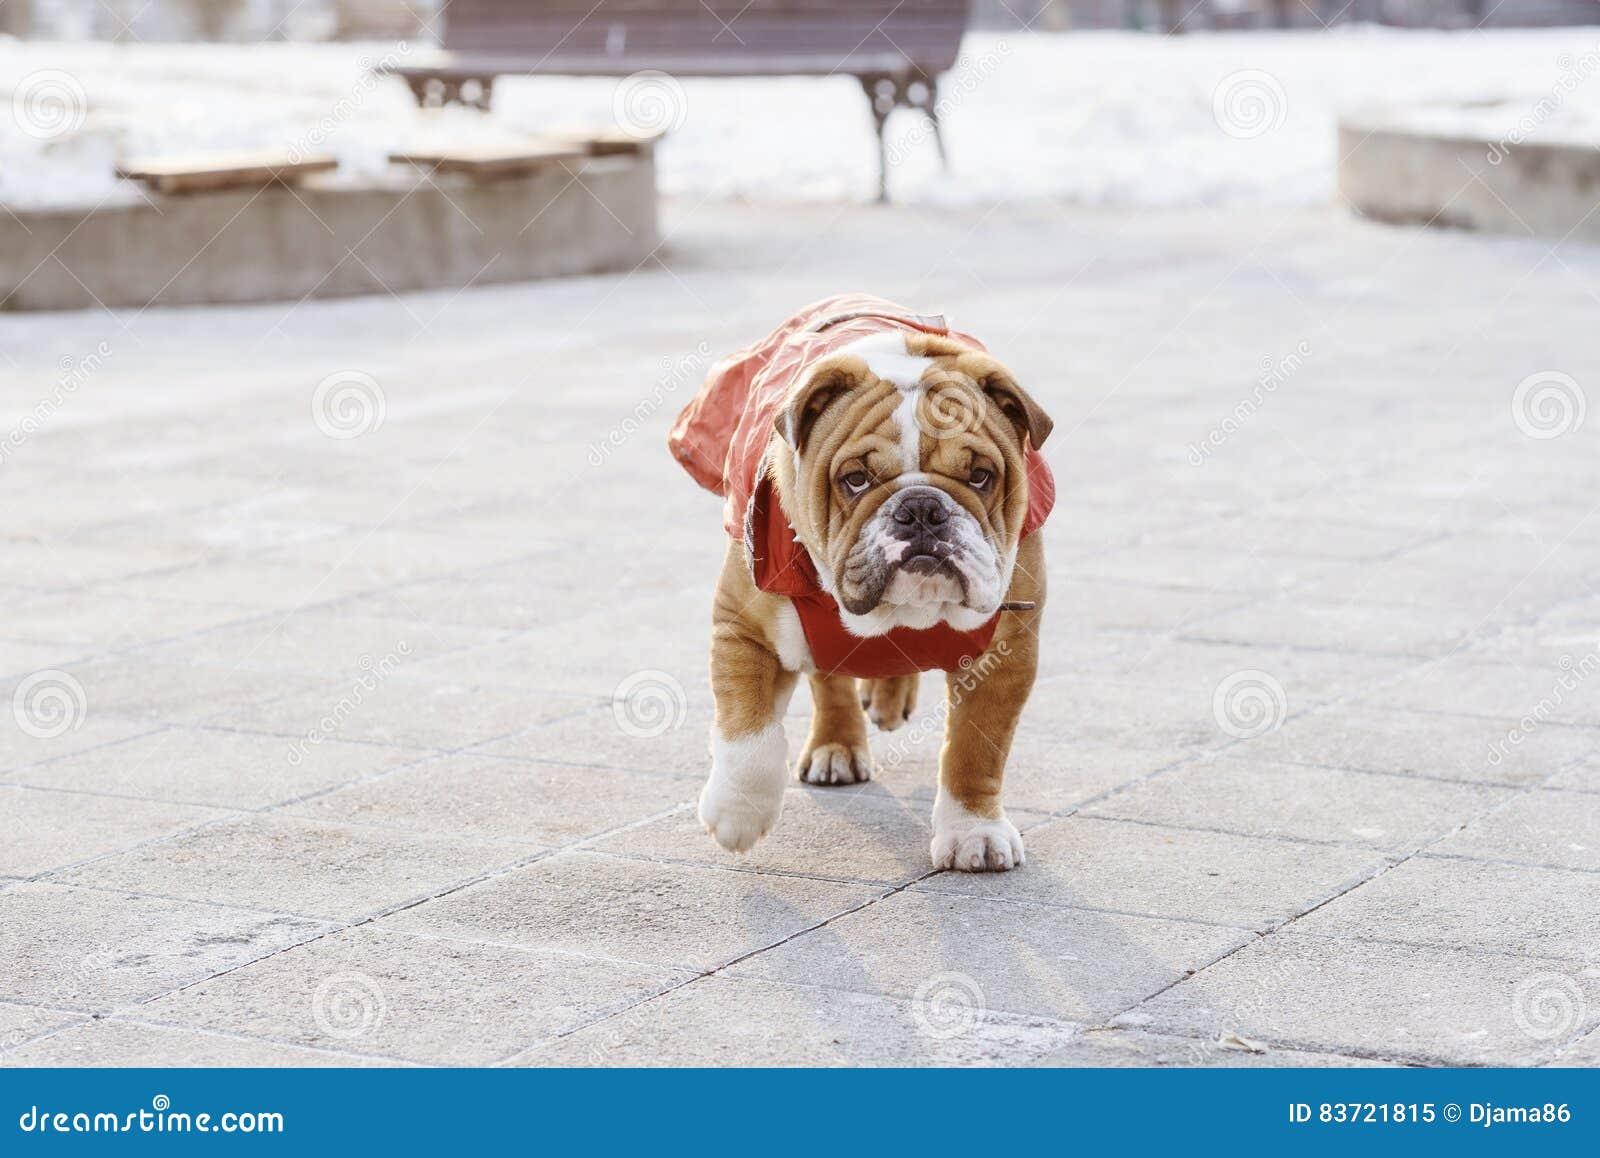 English Bulldog Pup In The Park Stock Photo